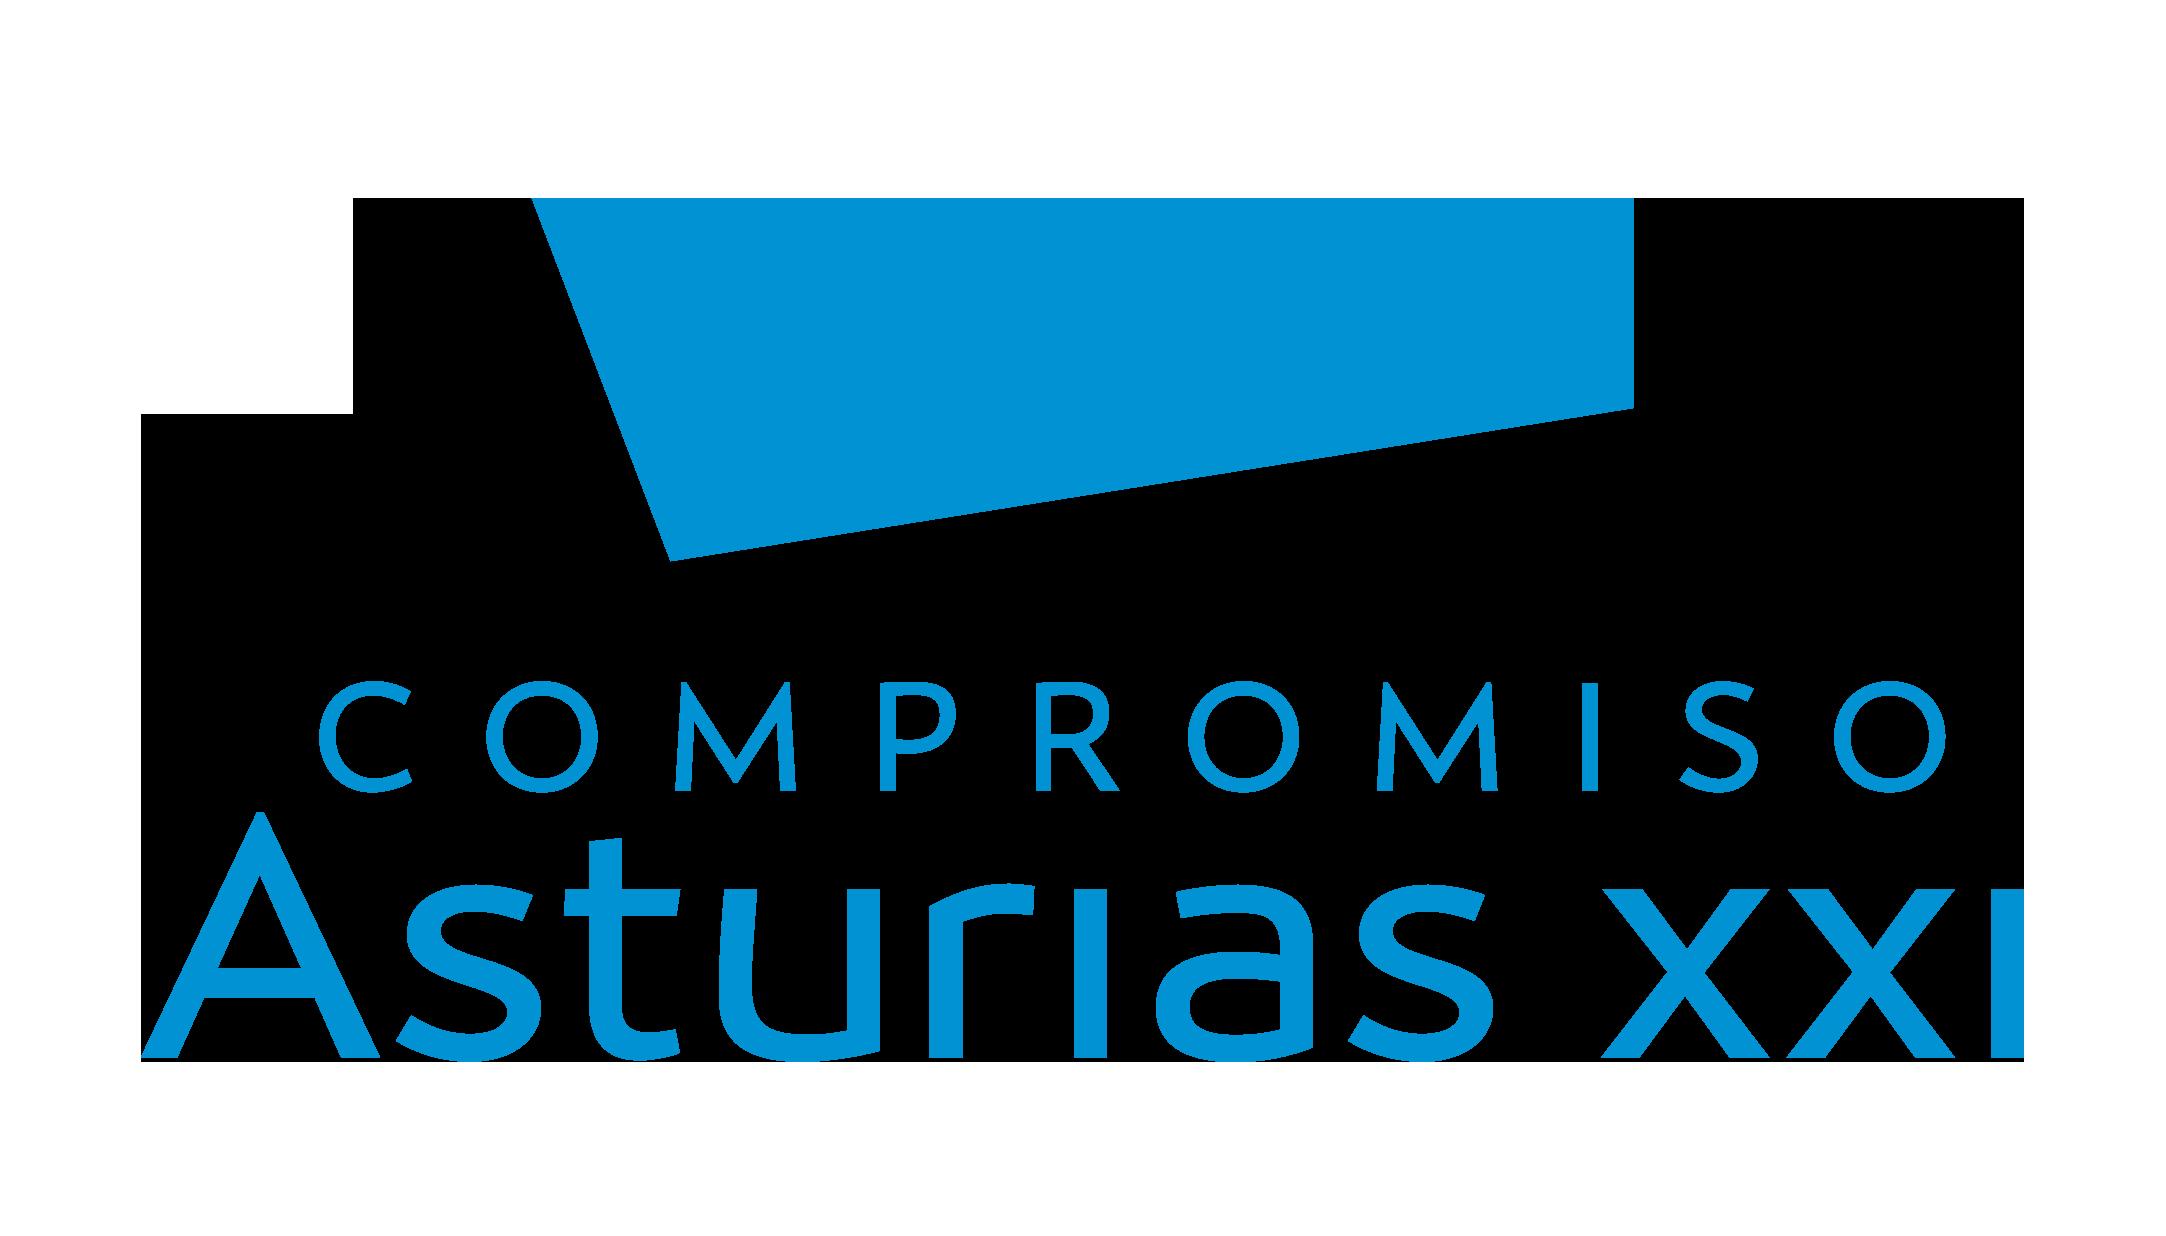 Logo compromiso asturias xxi vertical 828